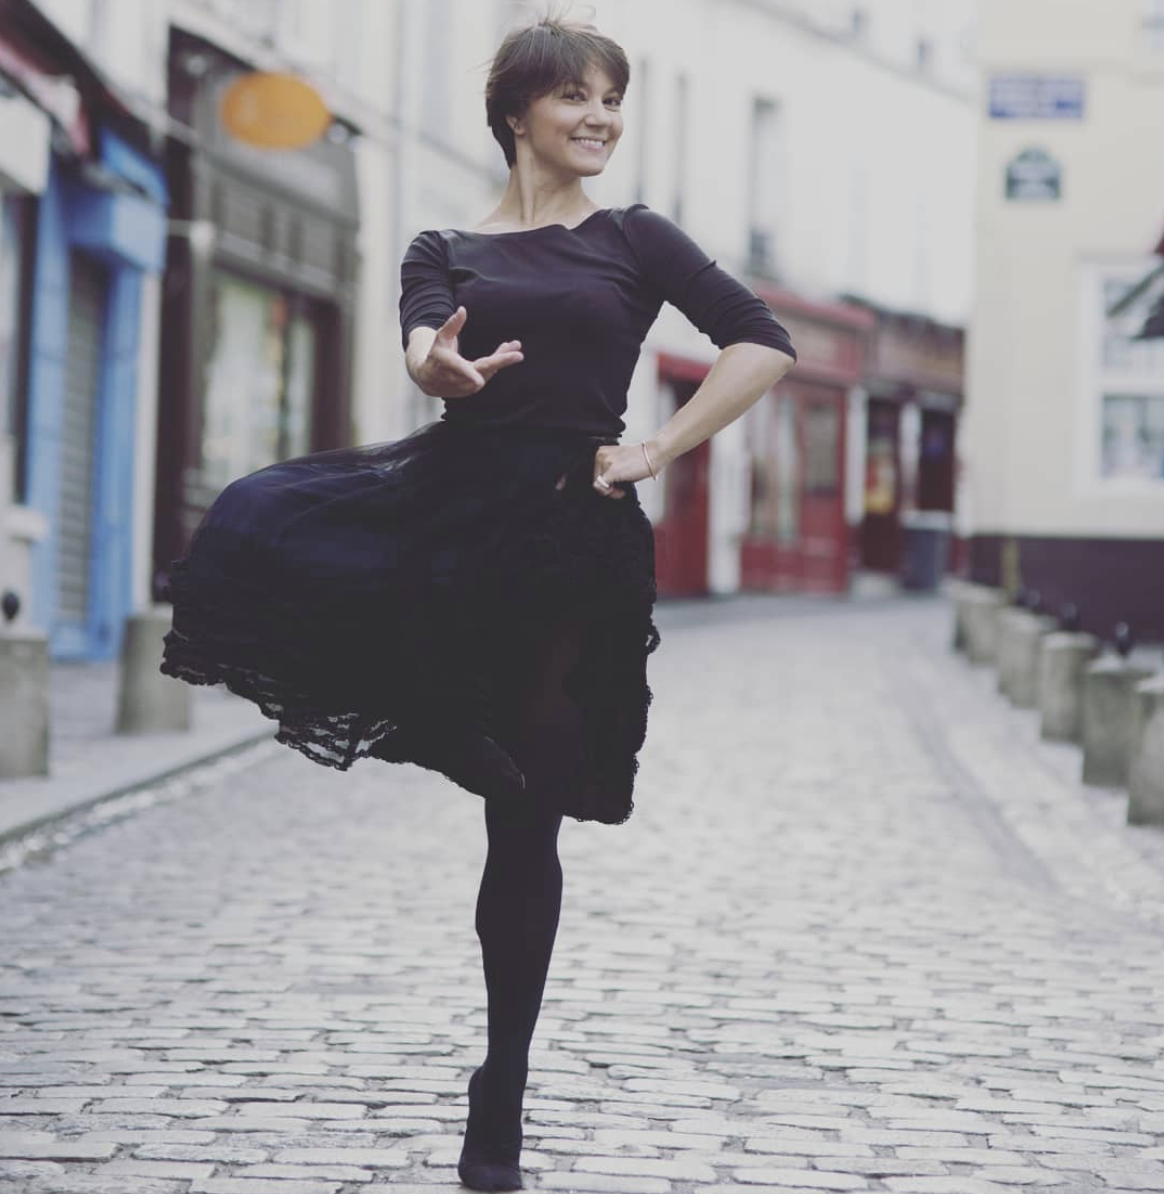 Olga dans les rues de paris.